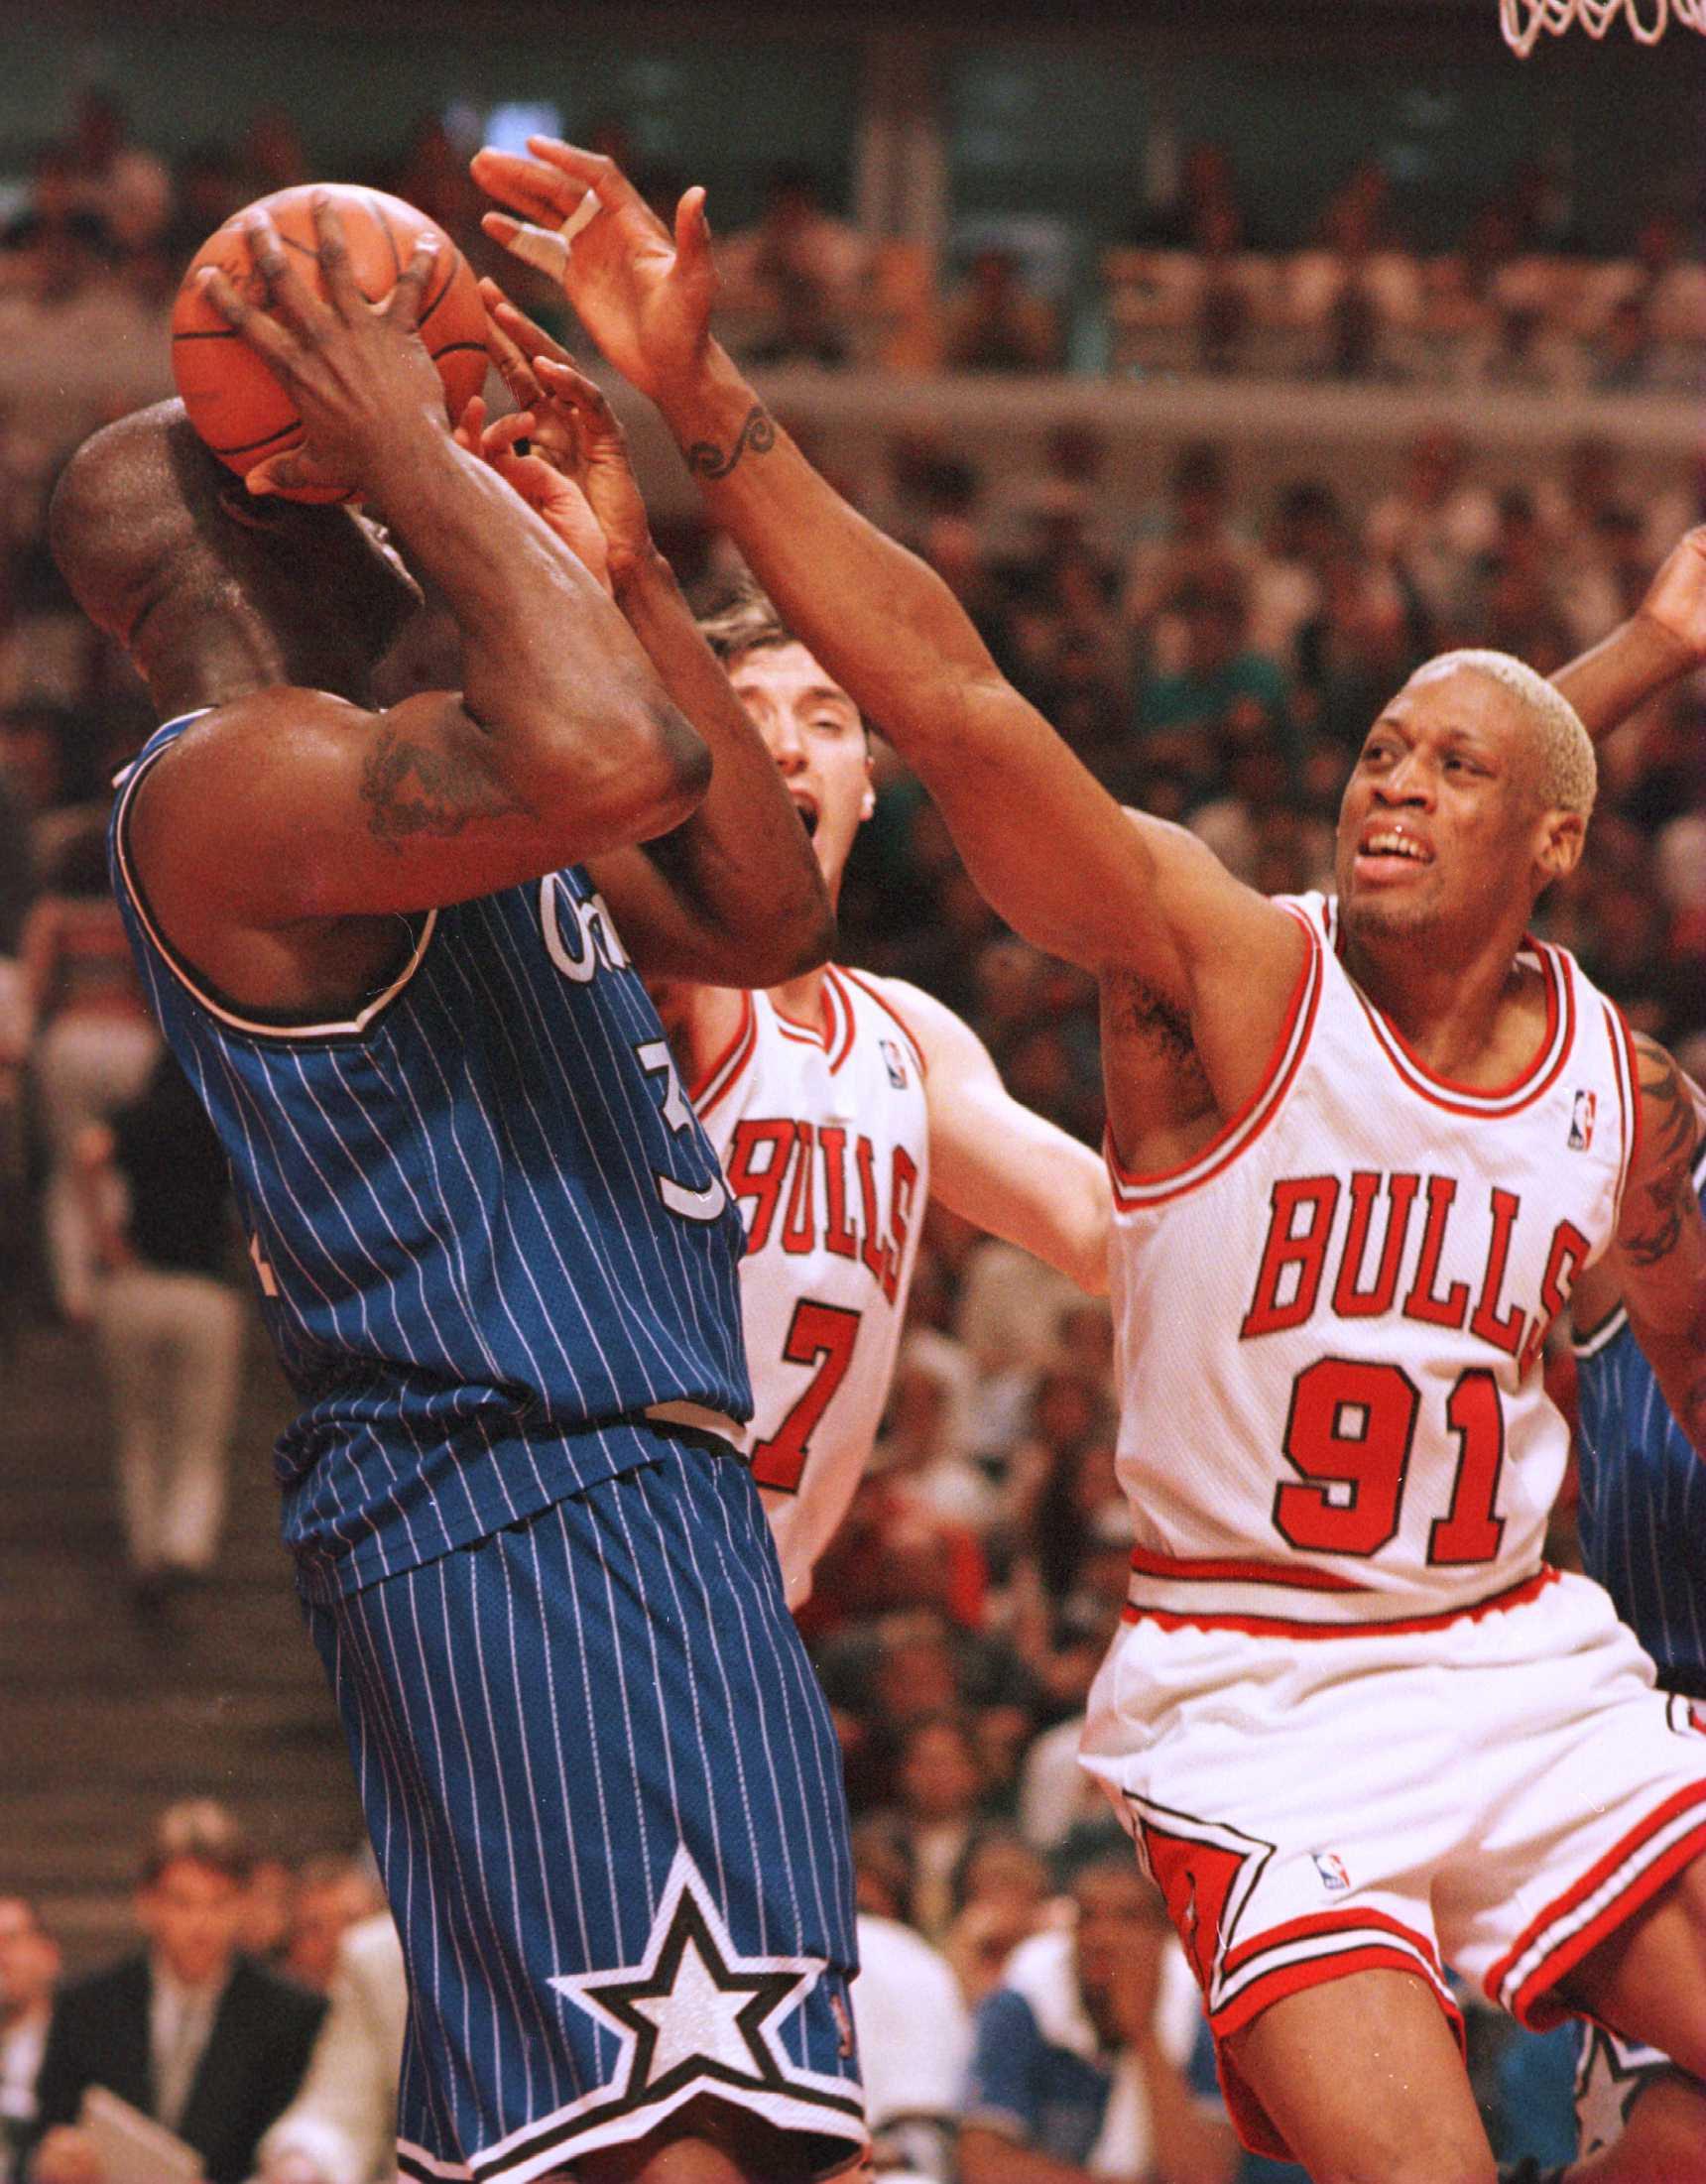 Chicago Bulls: Michael Jordan, Pippen and the 10 Best